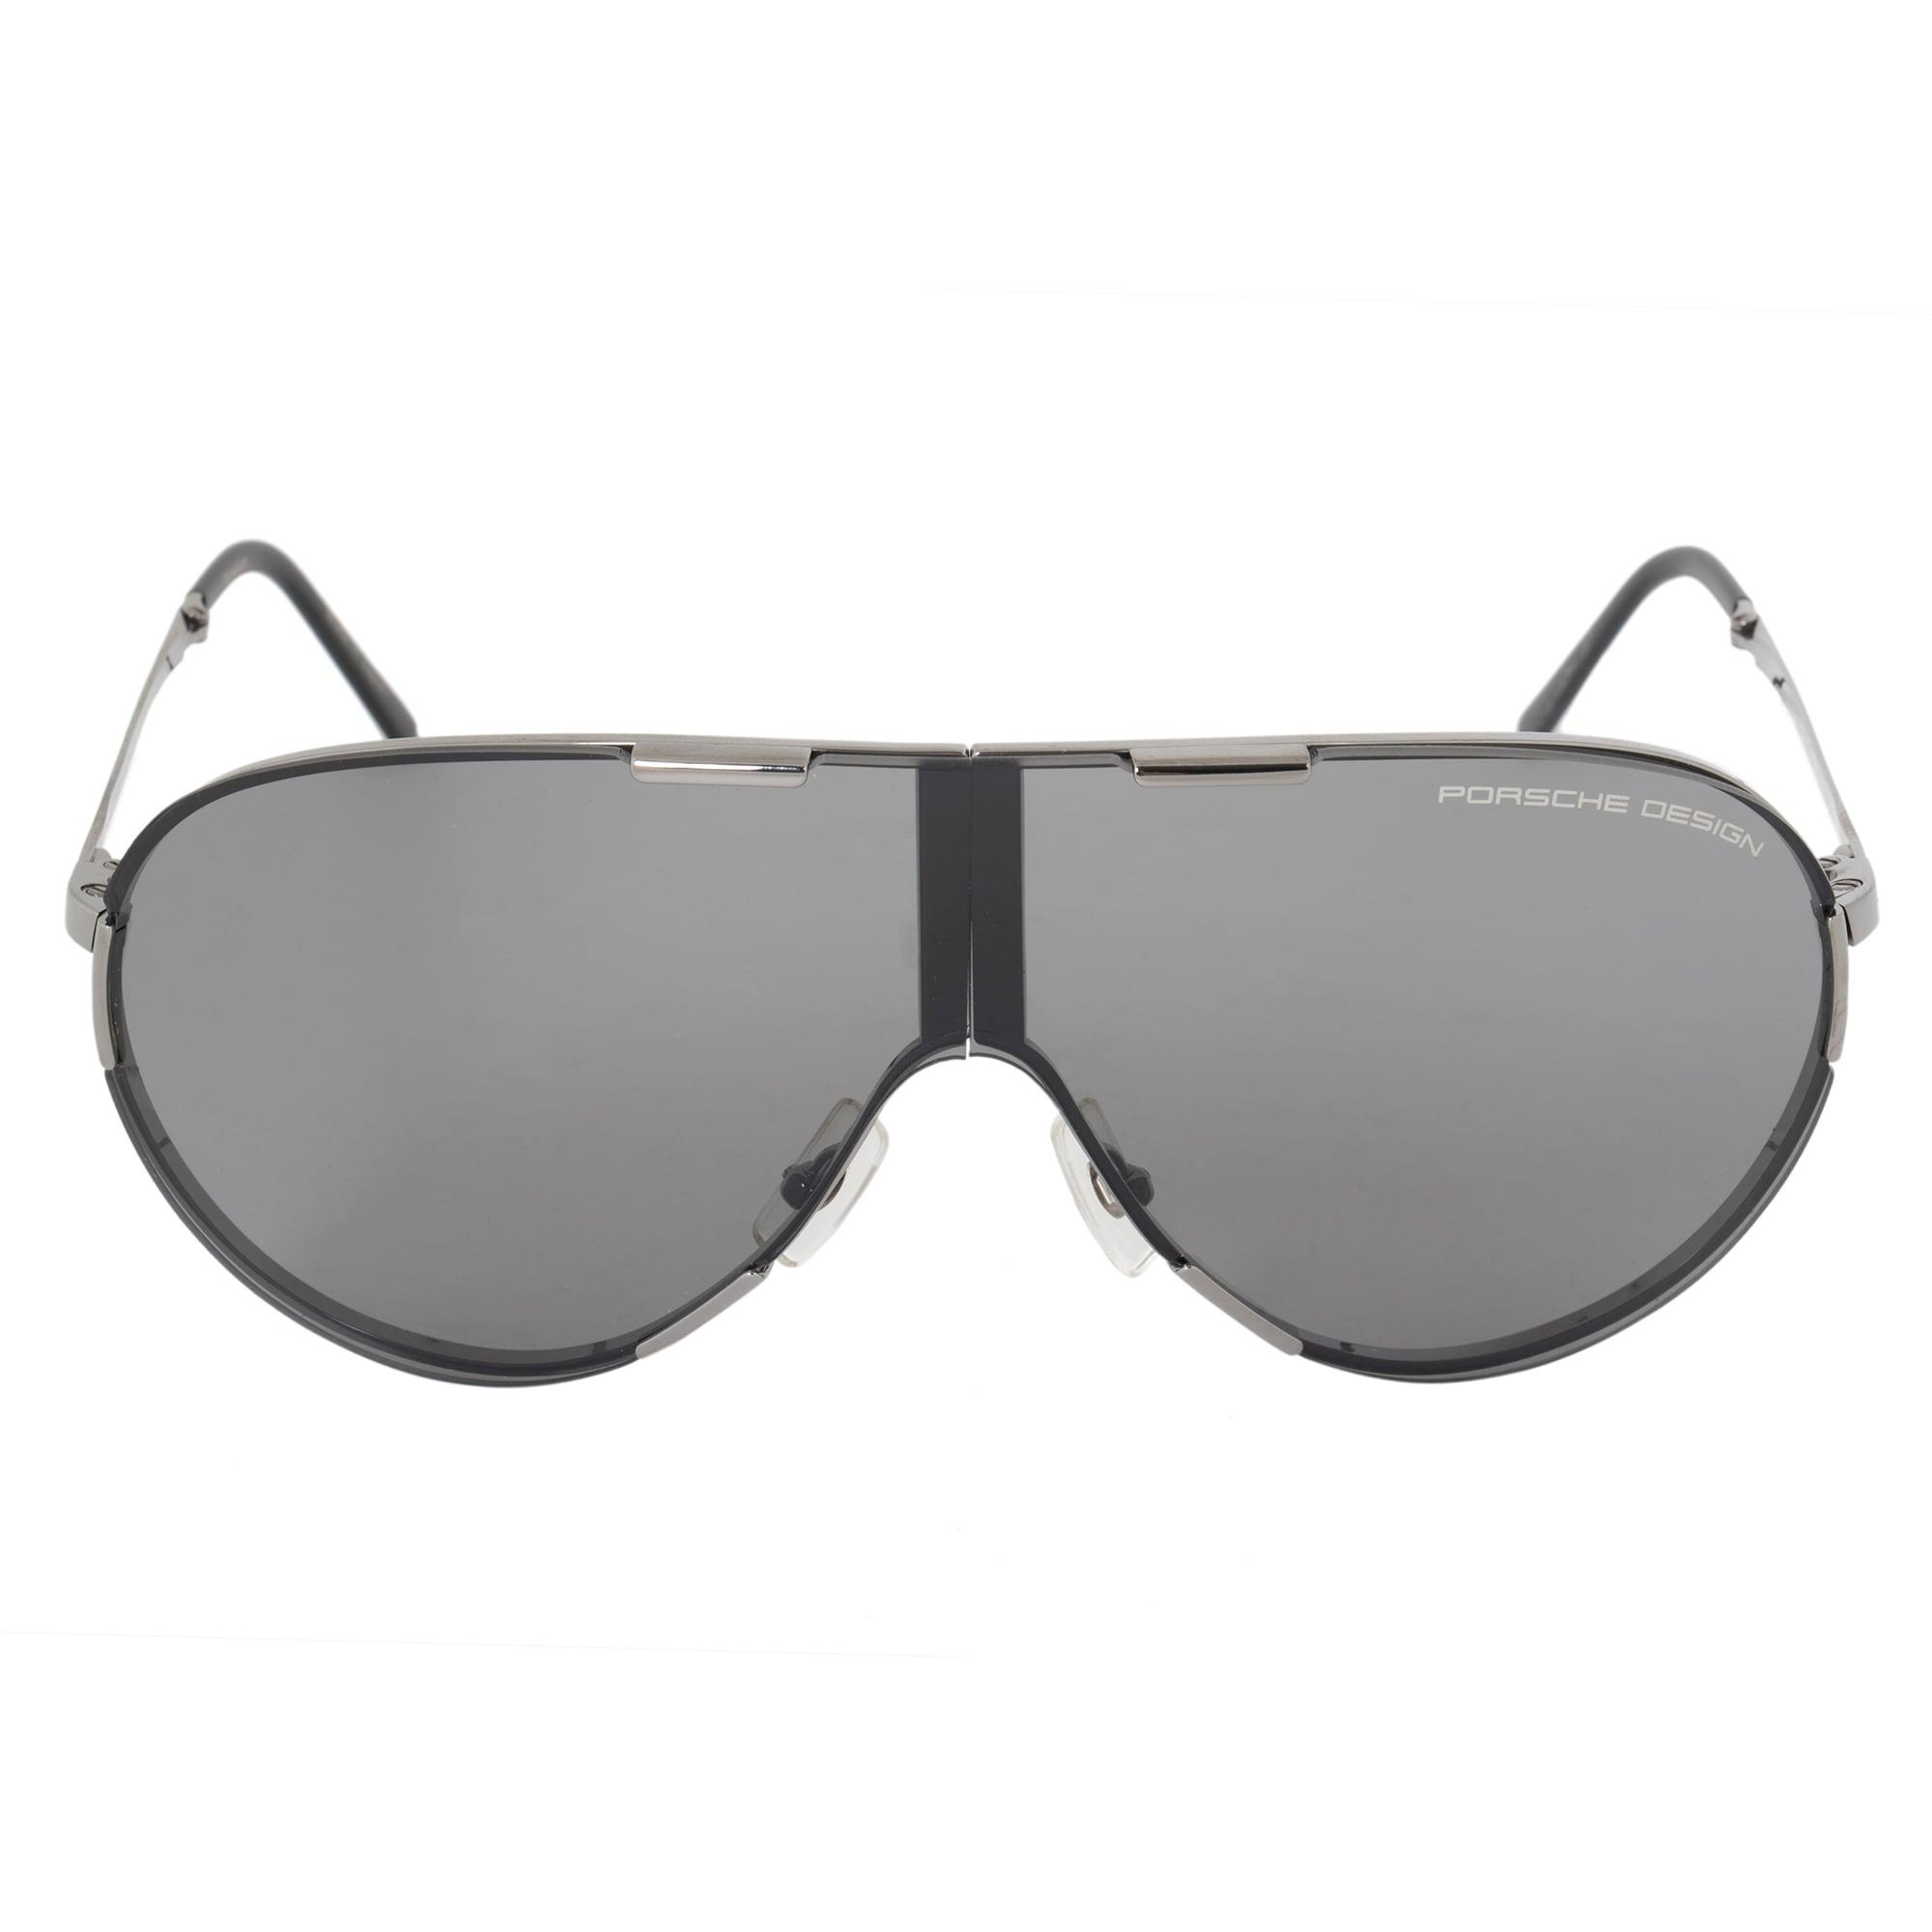 a364fe208b9 Shop Porsche Design Design P8486 C 71 Unbreakable Foldable Aviator  Sunglasses for Men - Free Shipping Today - Overstock - 19622833